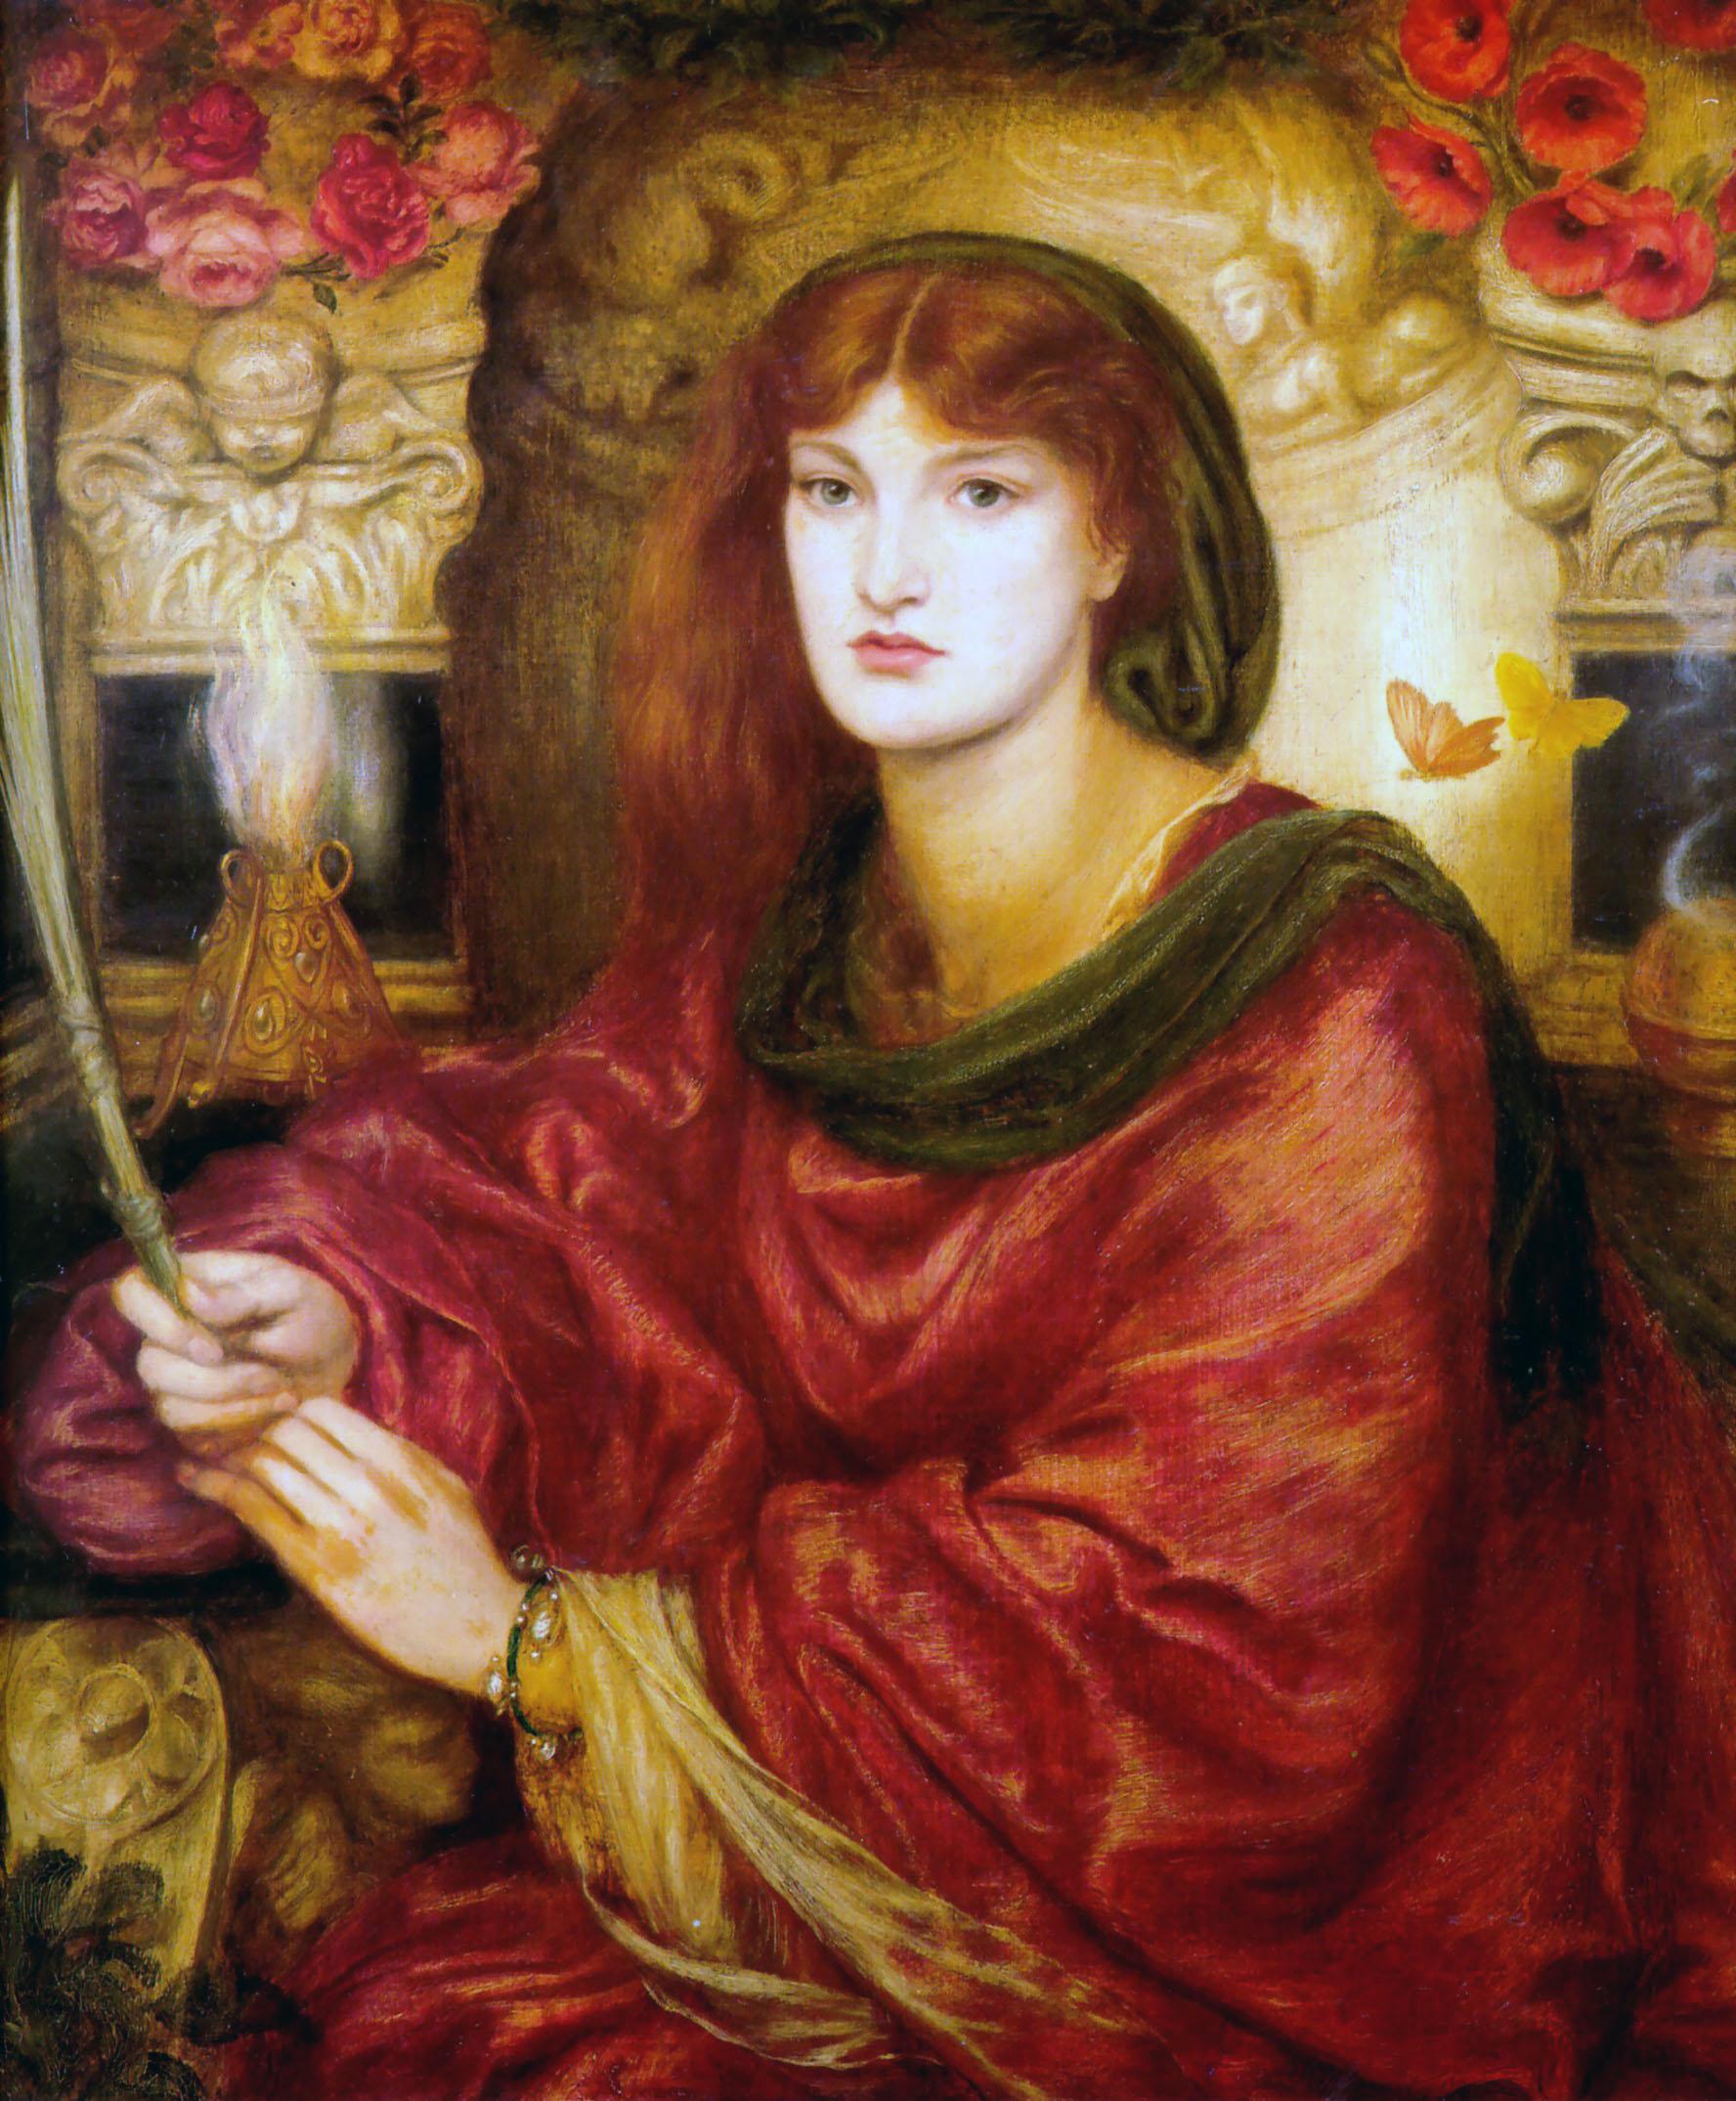 Lady Lilith - Wikipedia, the free encyclopedia